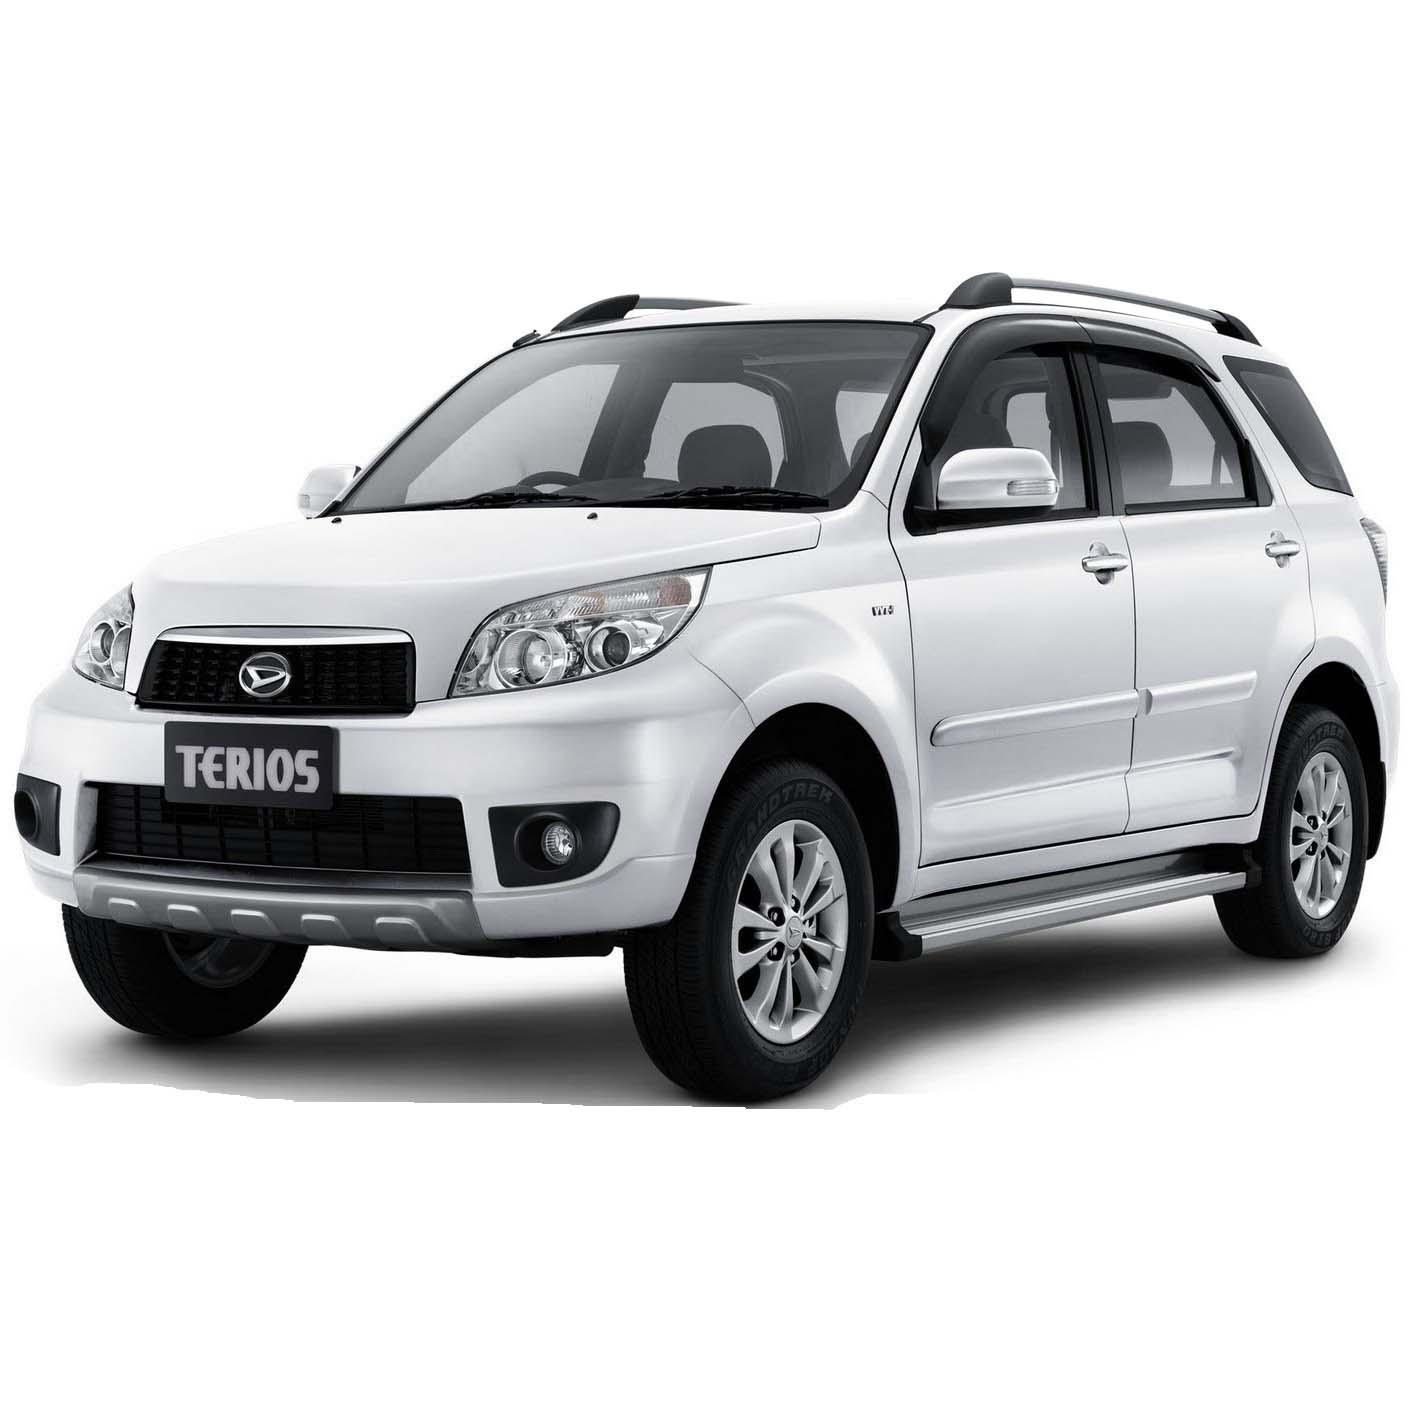 Daihatsu Terios Car Mats (All Models)